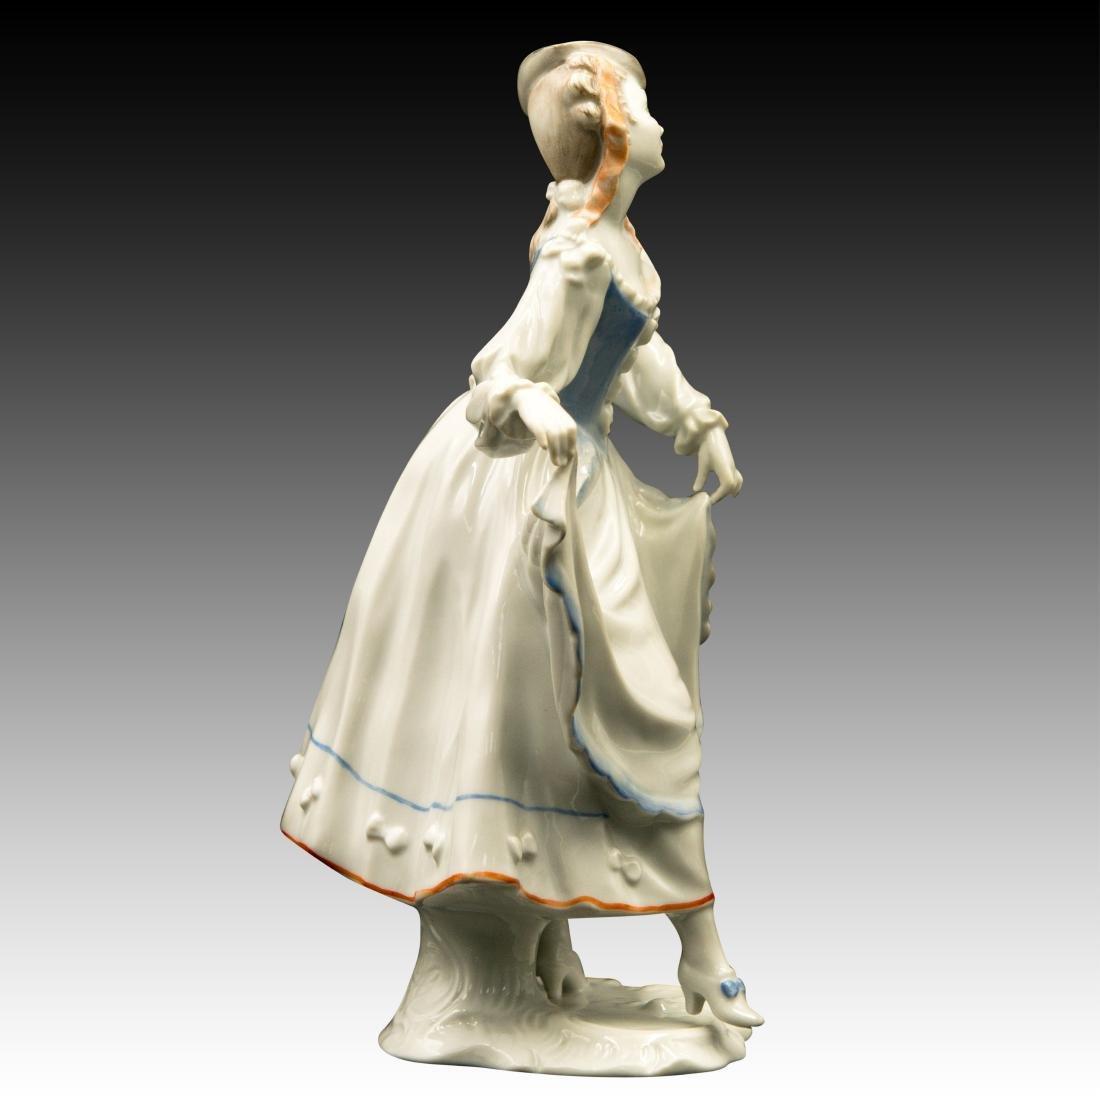 Rosenthal Rococo Lady Dancer Figurine - 2